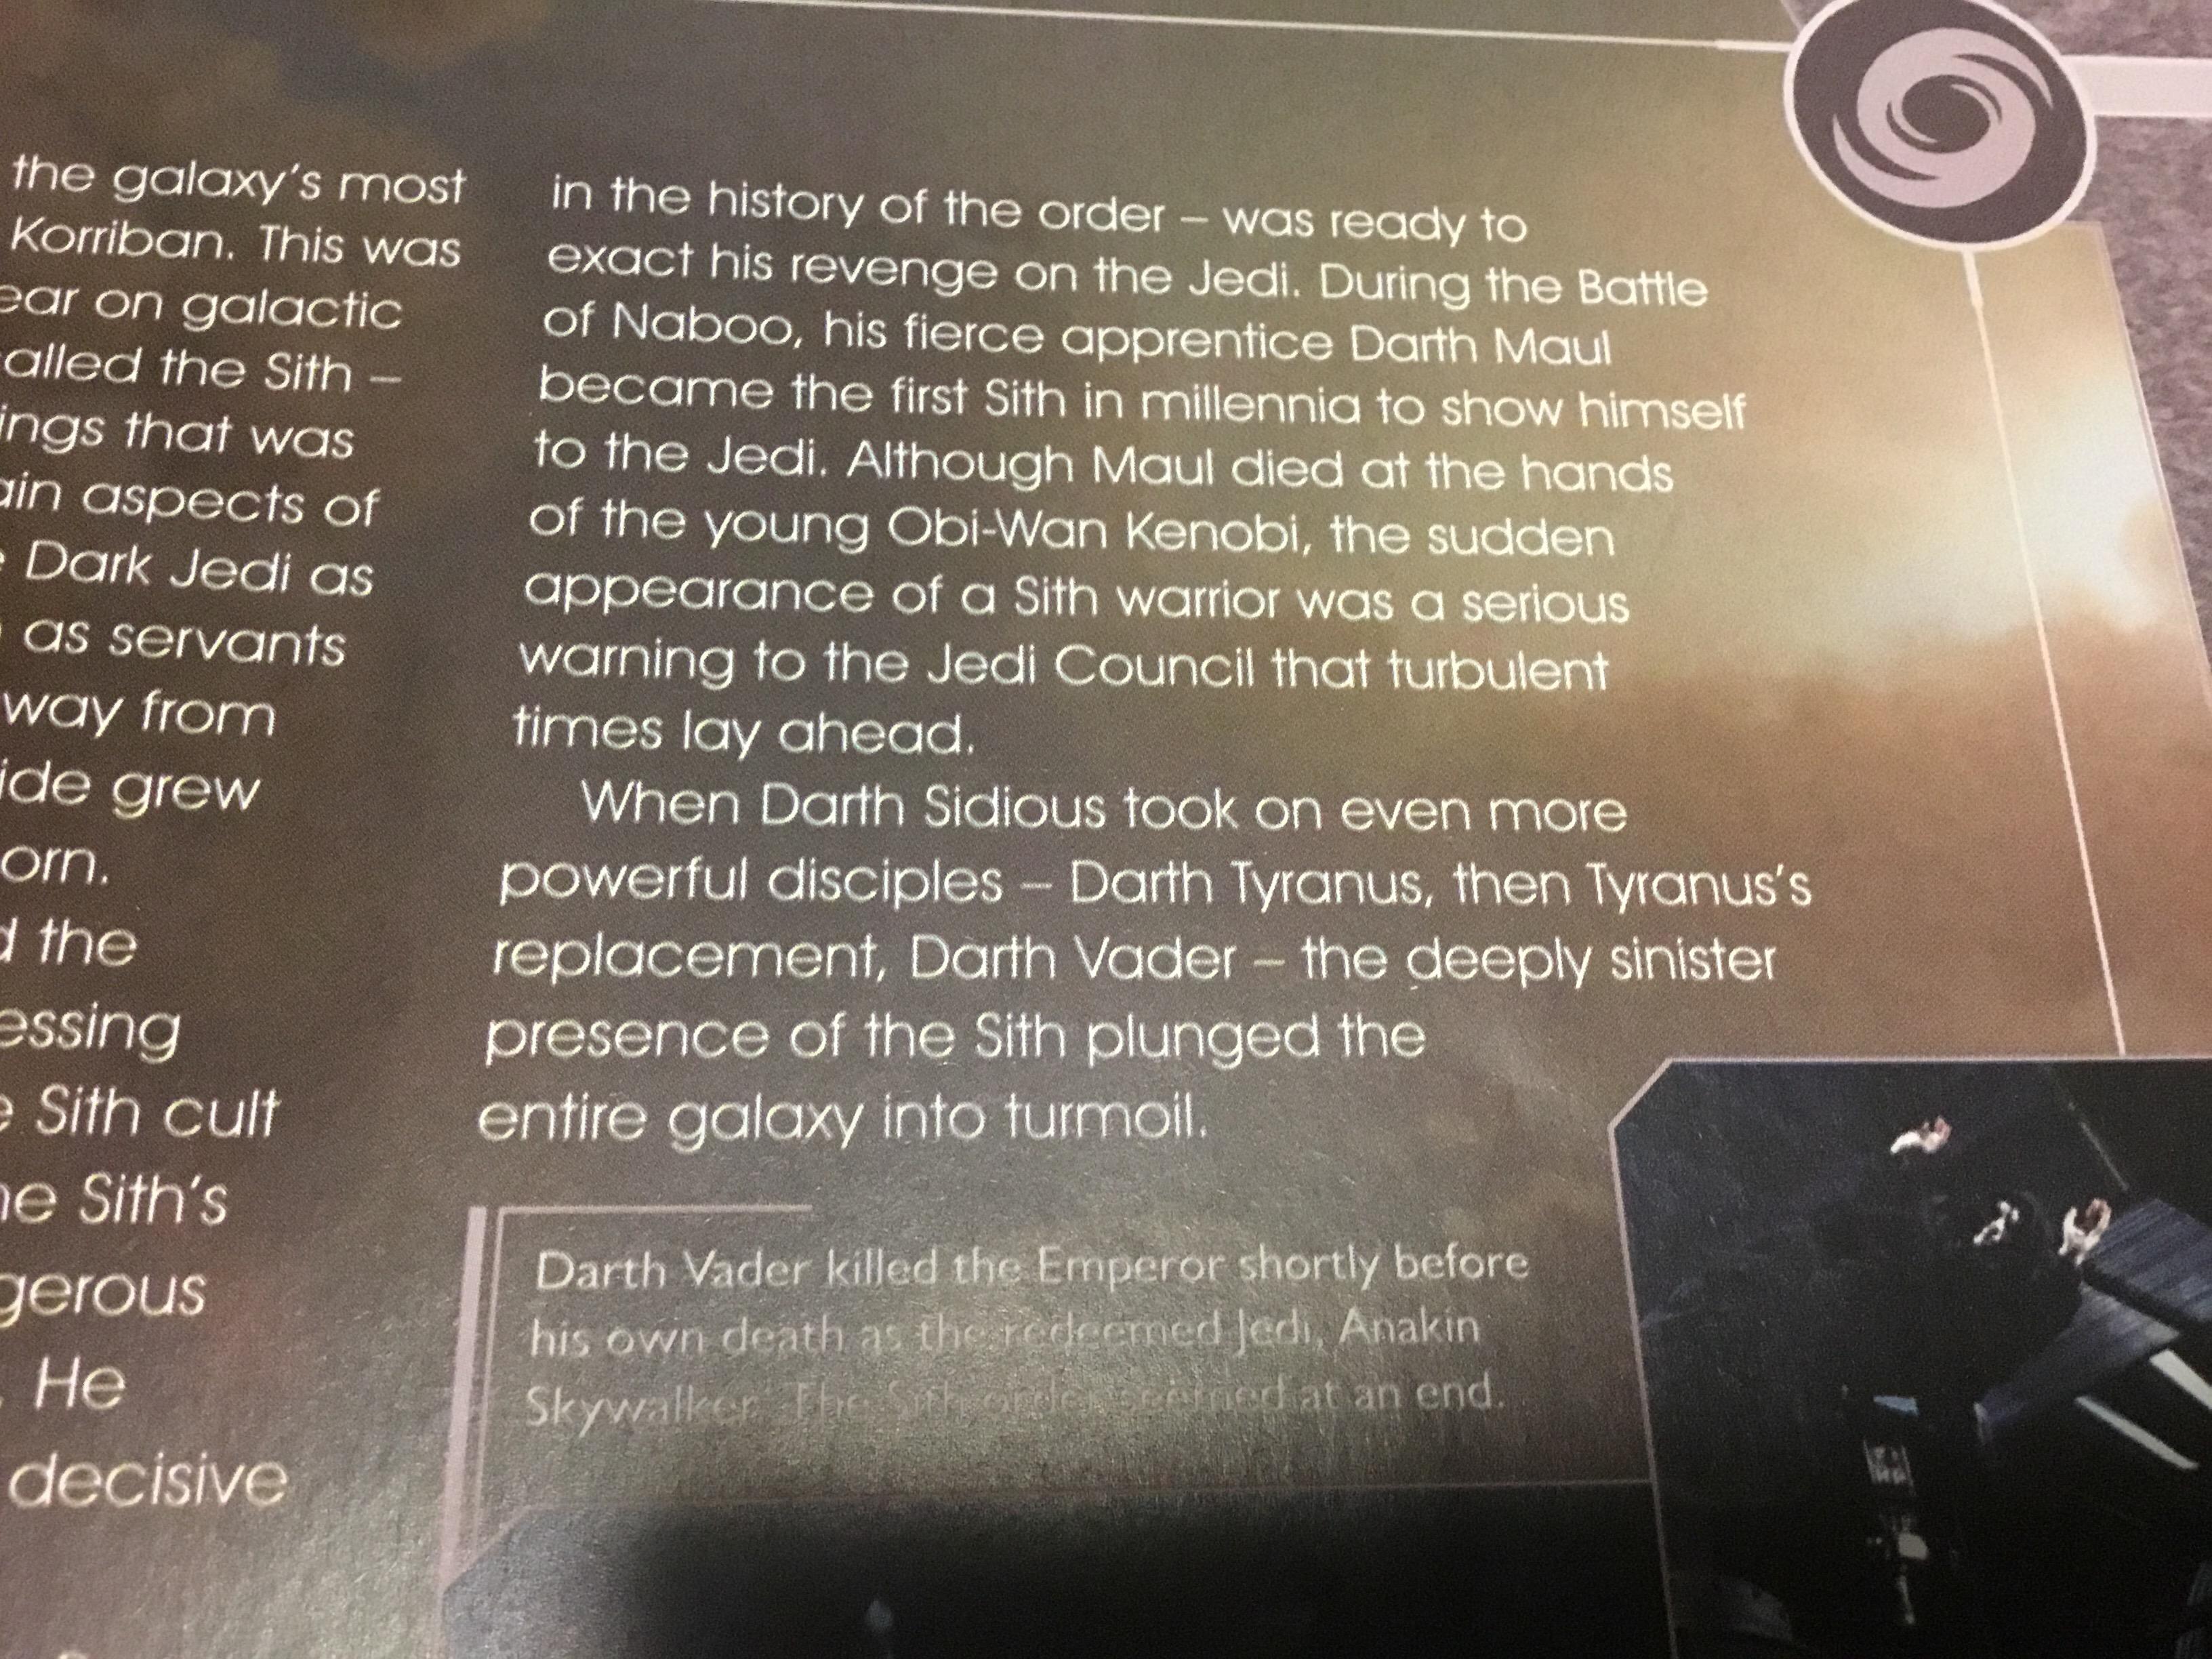 Darth Vader (RotJ) and Luke Skywalker (RotJ) vs B-Team - Page 2 2019-04-22